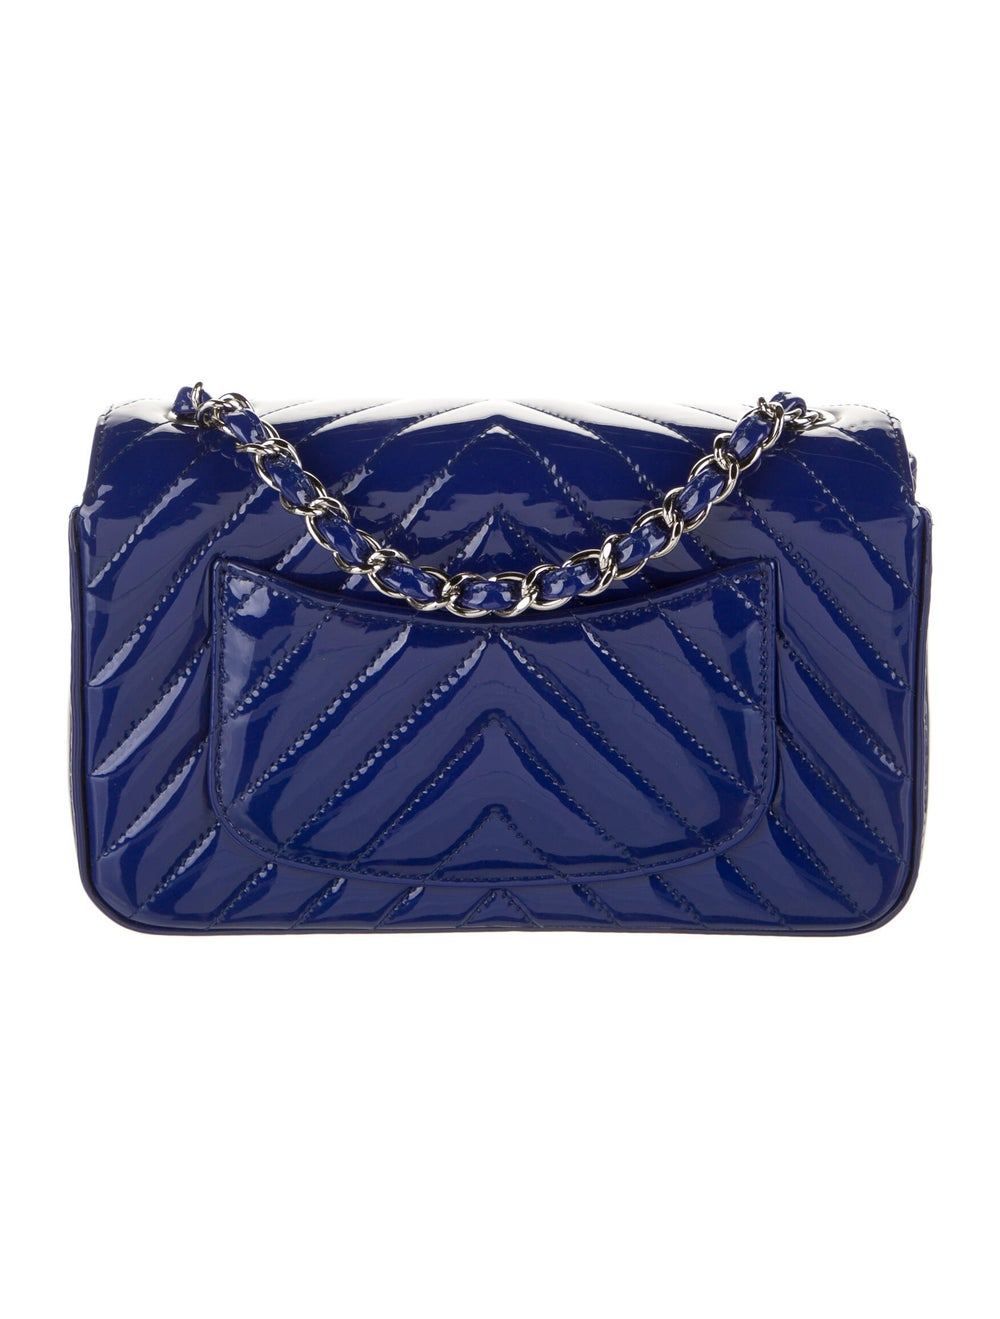 Chanel New Mini Chevron Flap Bag Blue - image 4